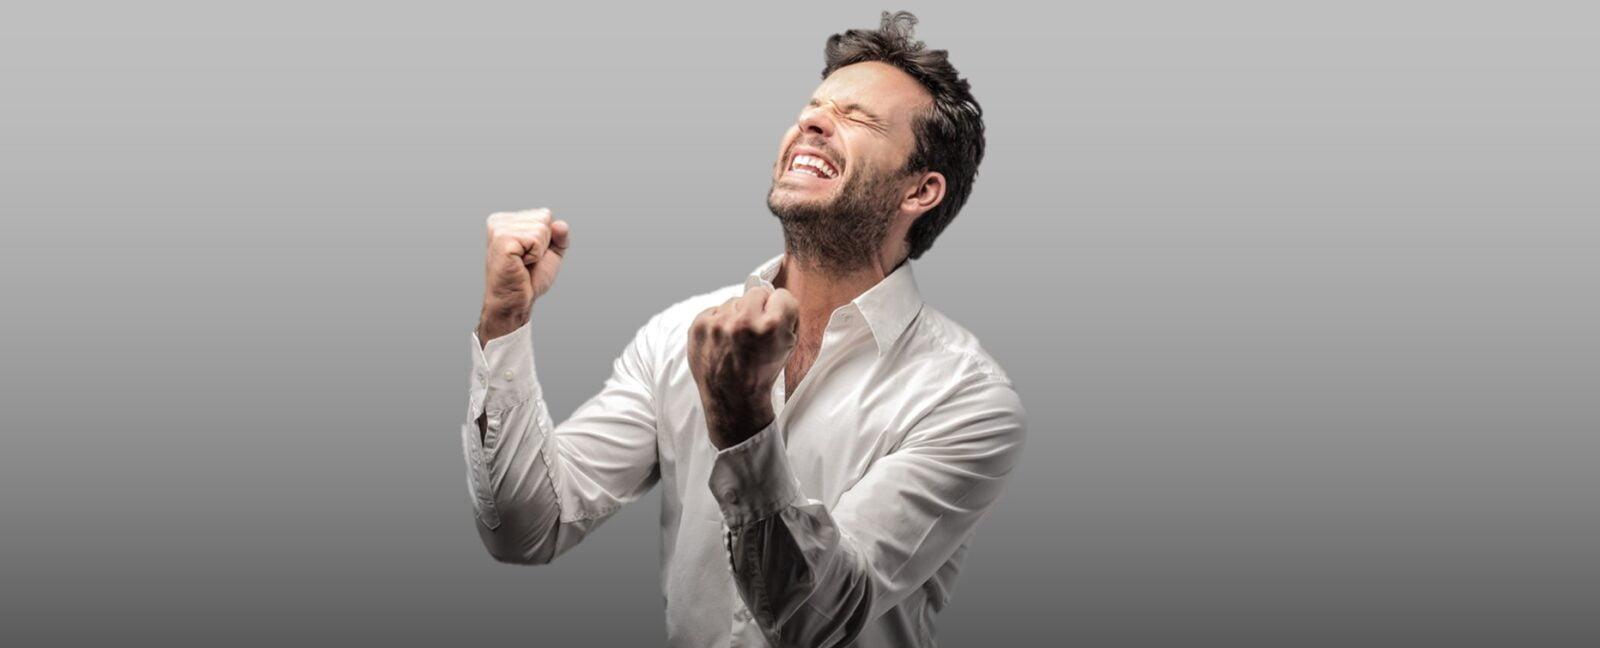 Happy Man Cash Discount Processing